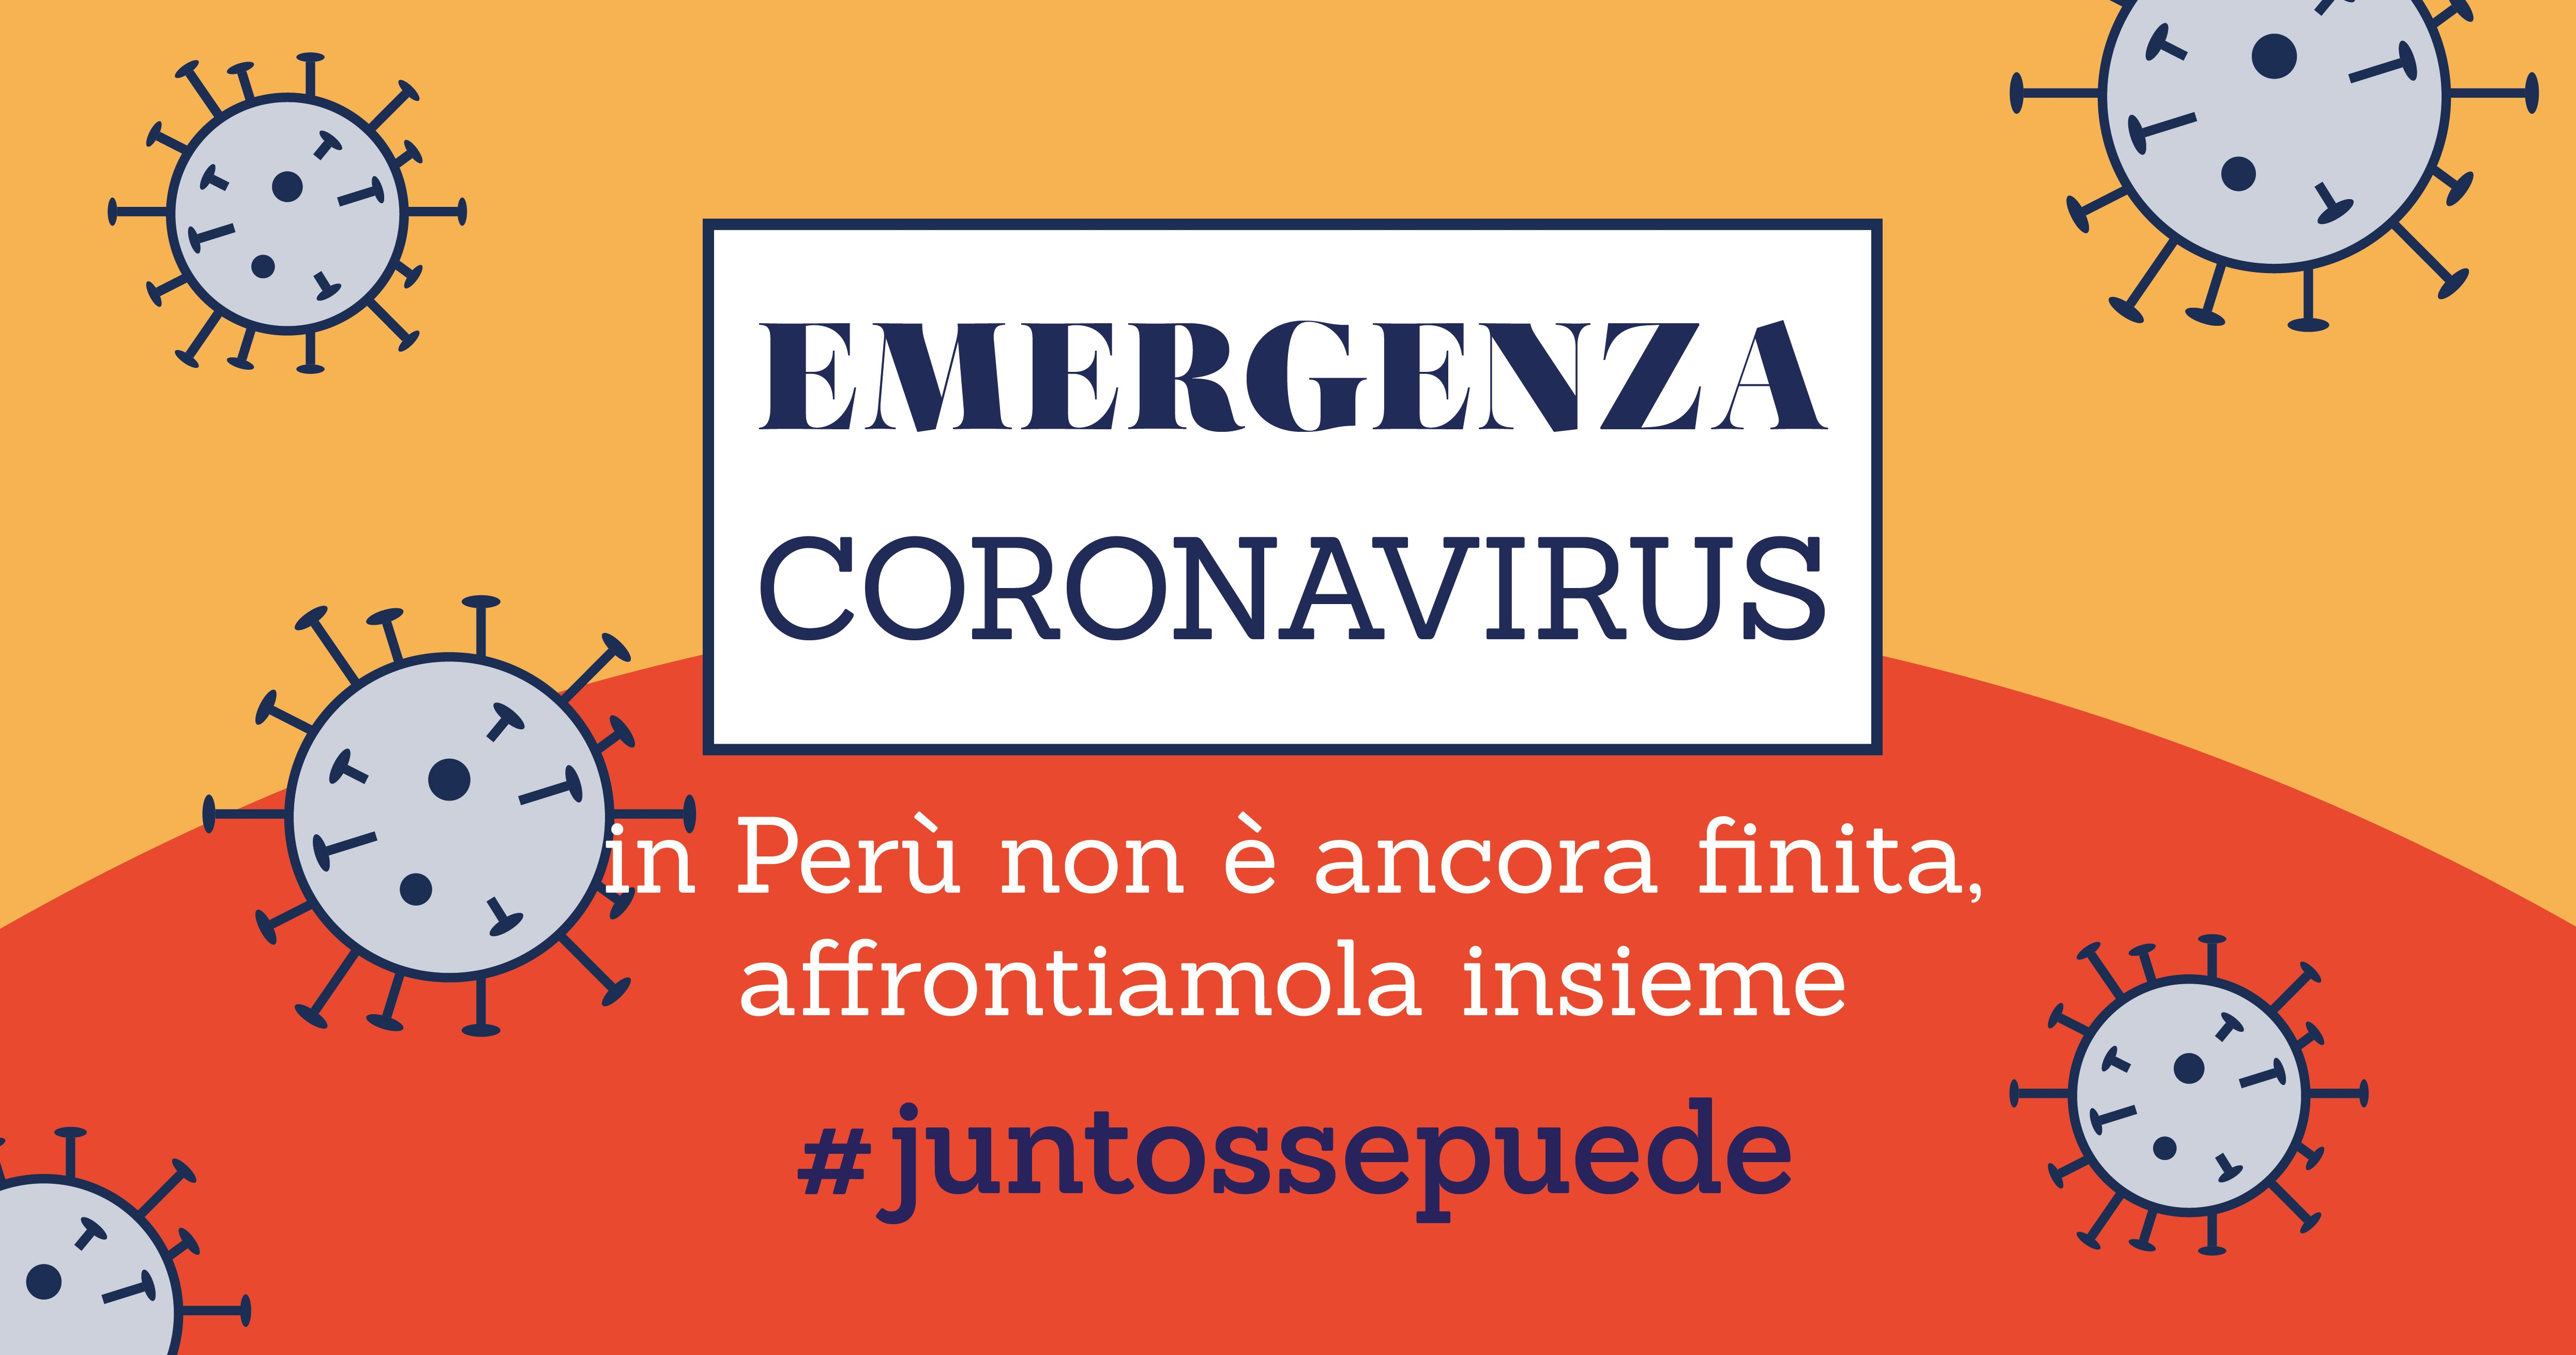 Emergenza: affrontiamola insieme-Compagnia del Perù Onlus